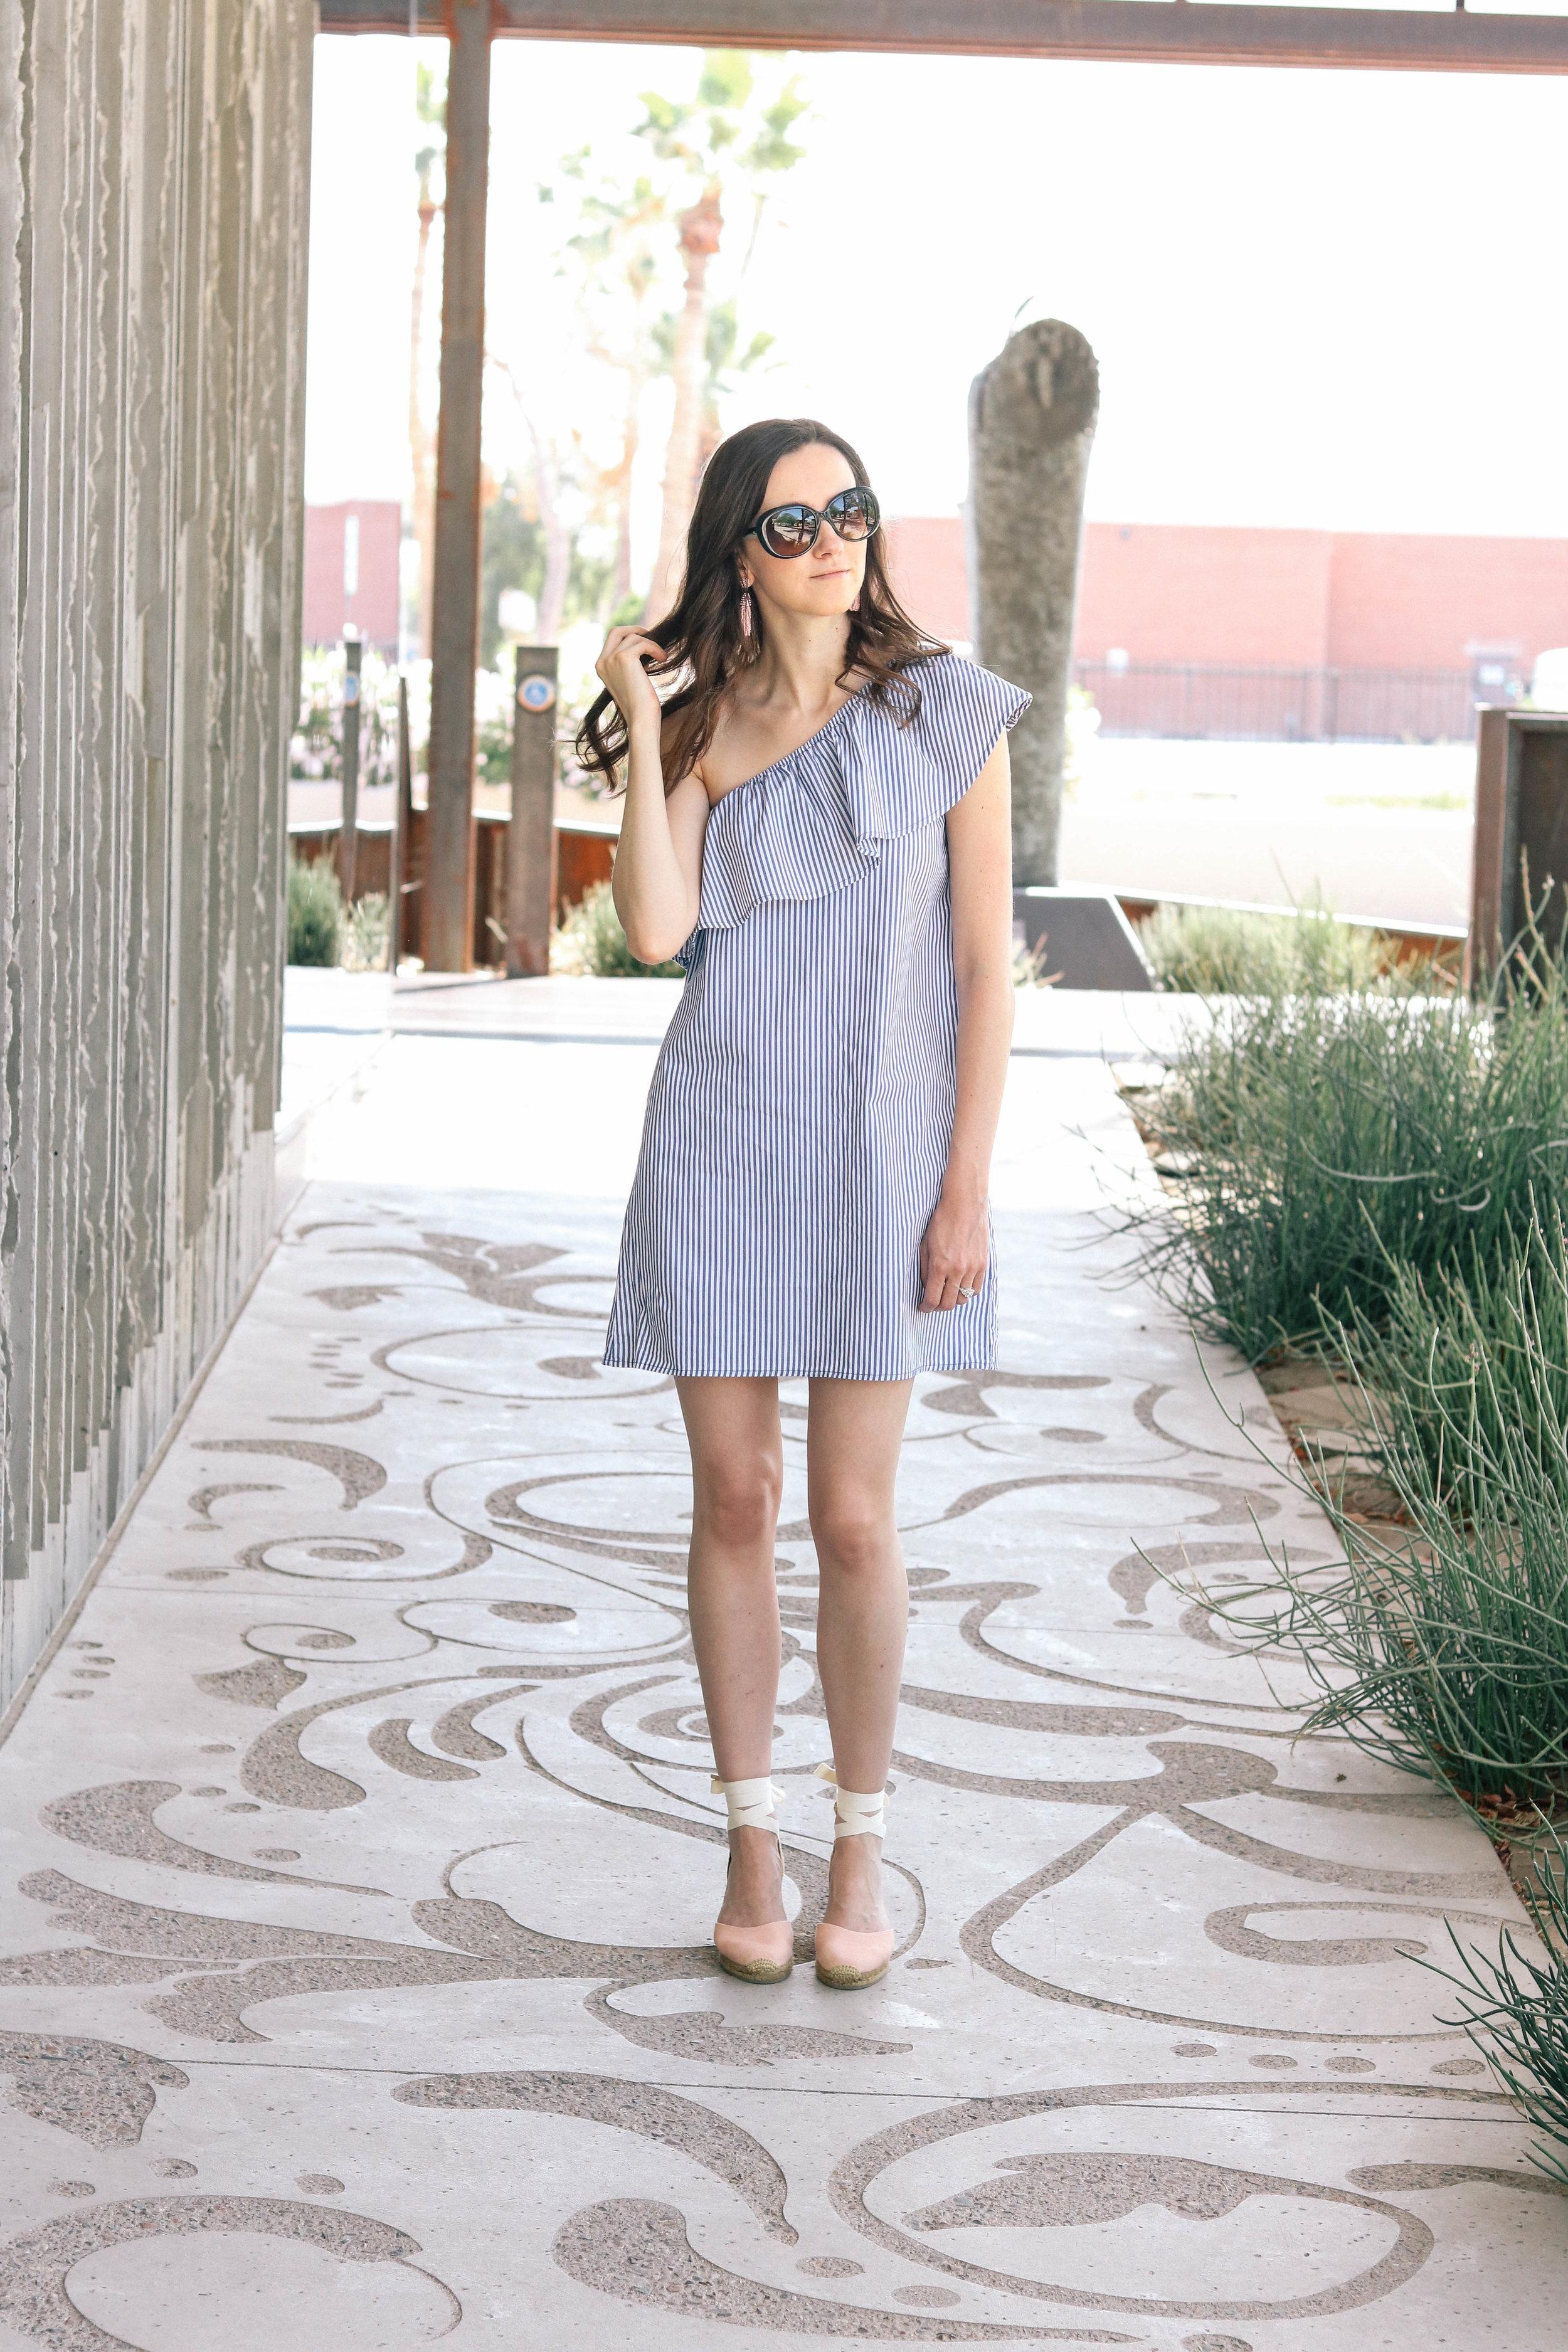 bb-ruffle-dress-001 (1 of 1).jpg